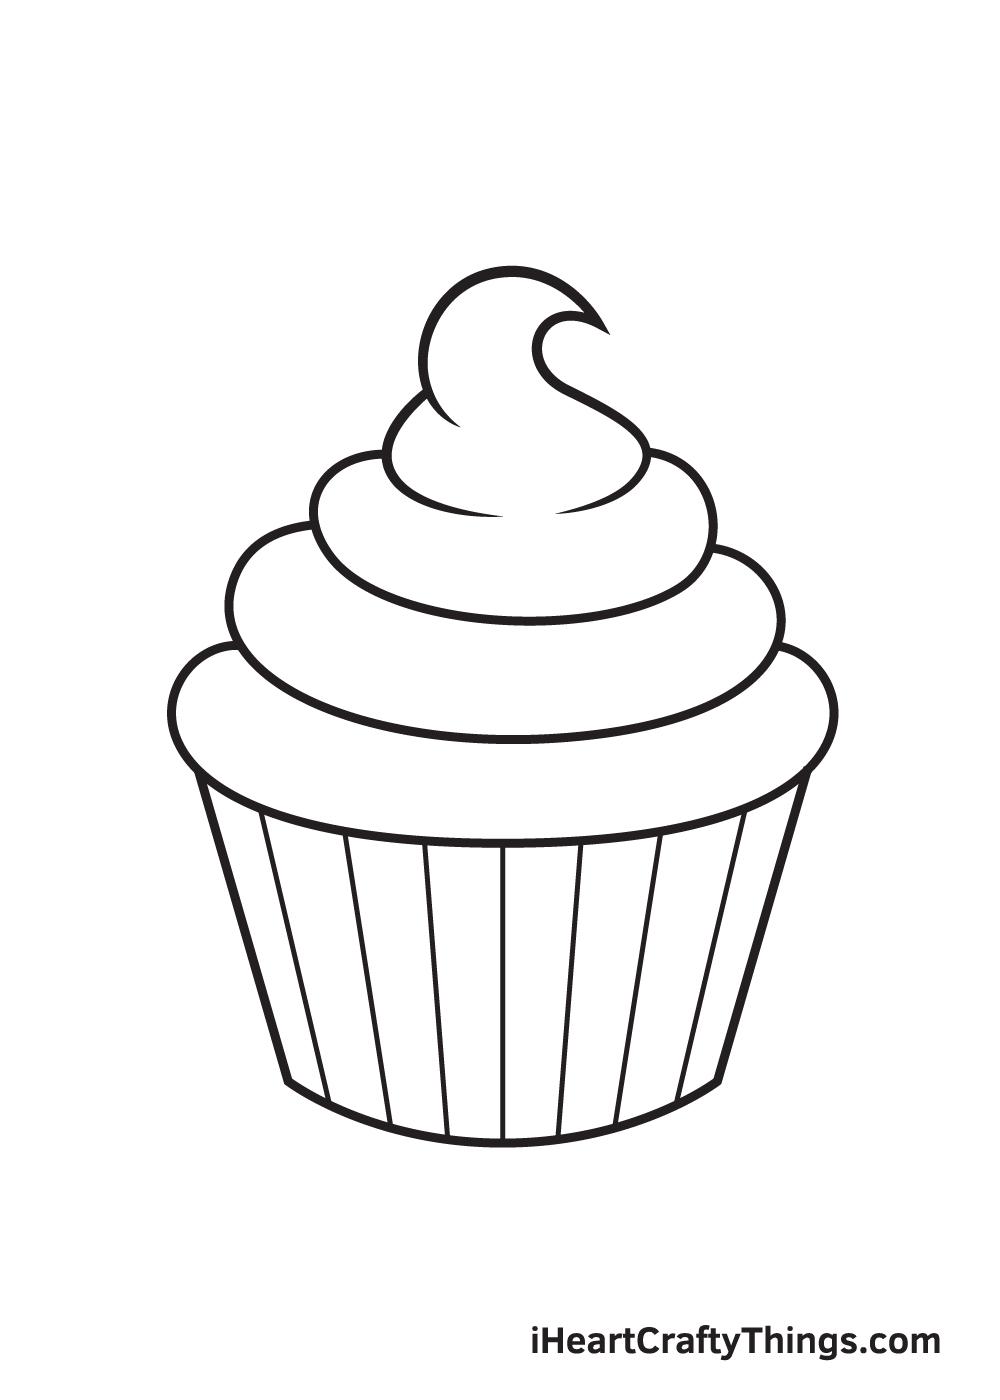 Cupcake Drawing – Step 7